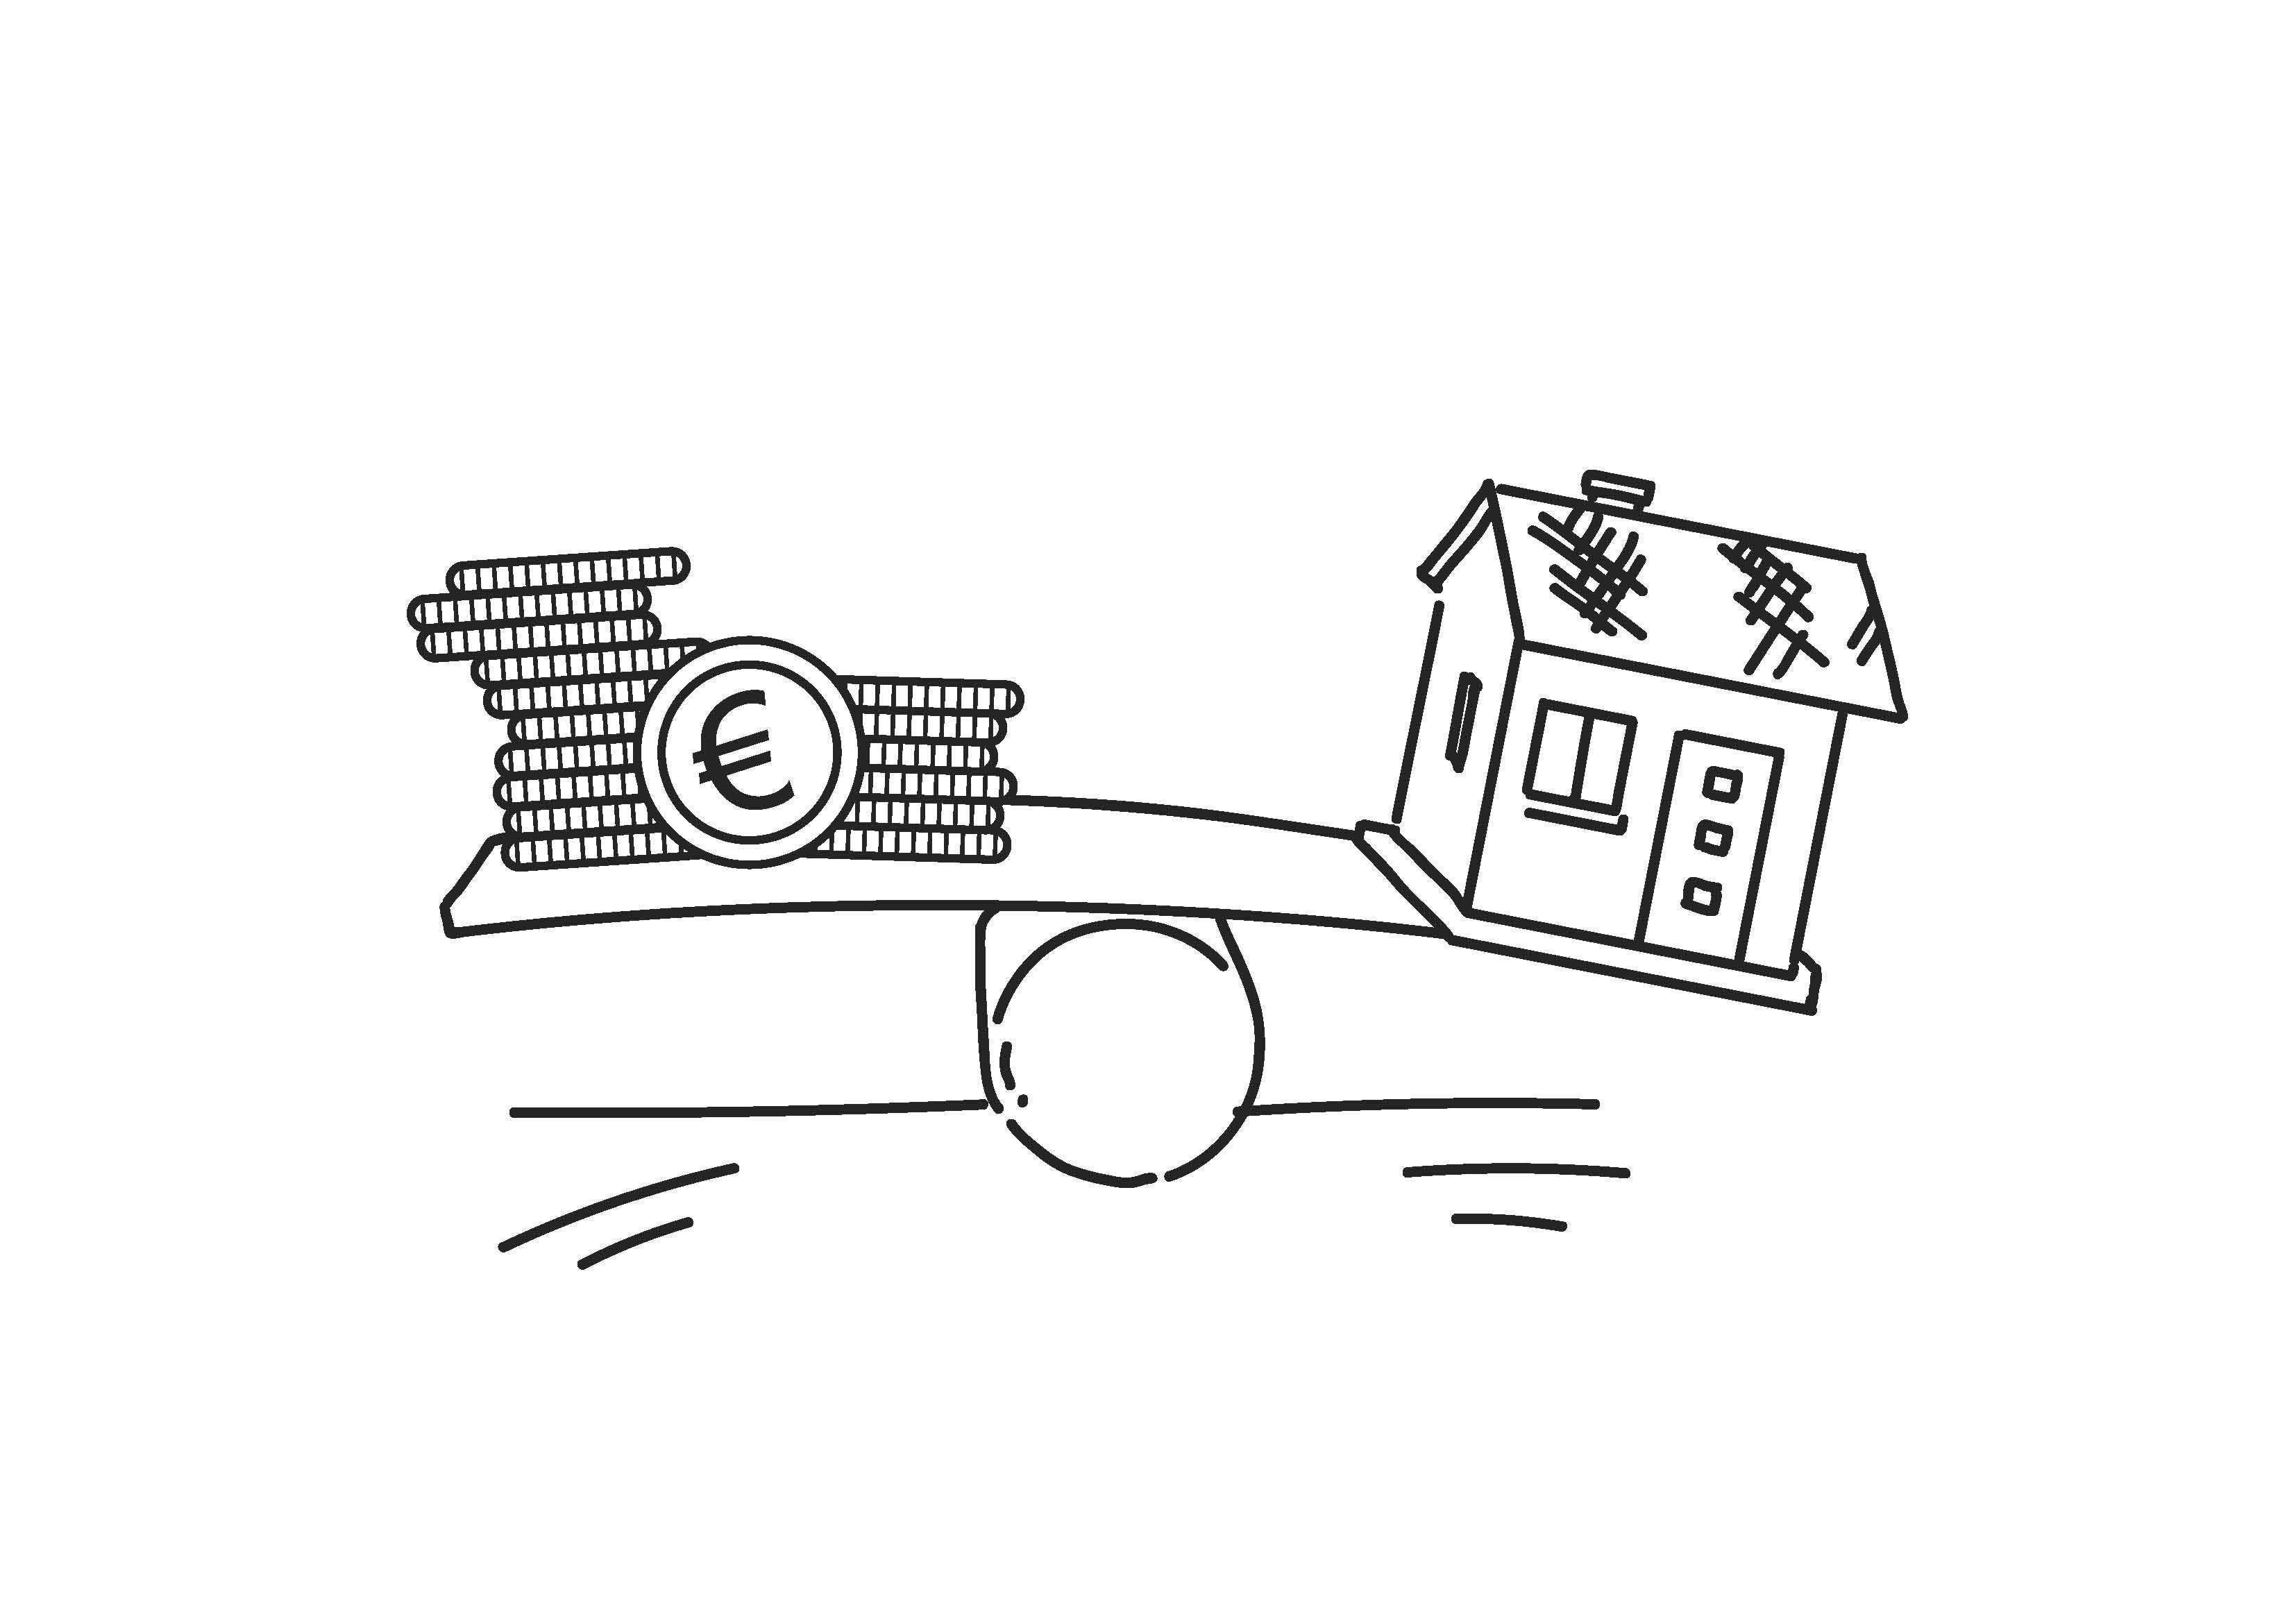 verkehrswert berechnen oder marktwert berechnen so. Black Bedroom Furniture Sets. Home Design Ideas